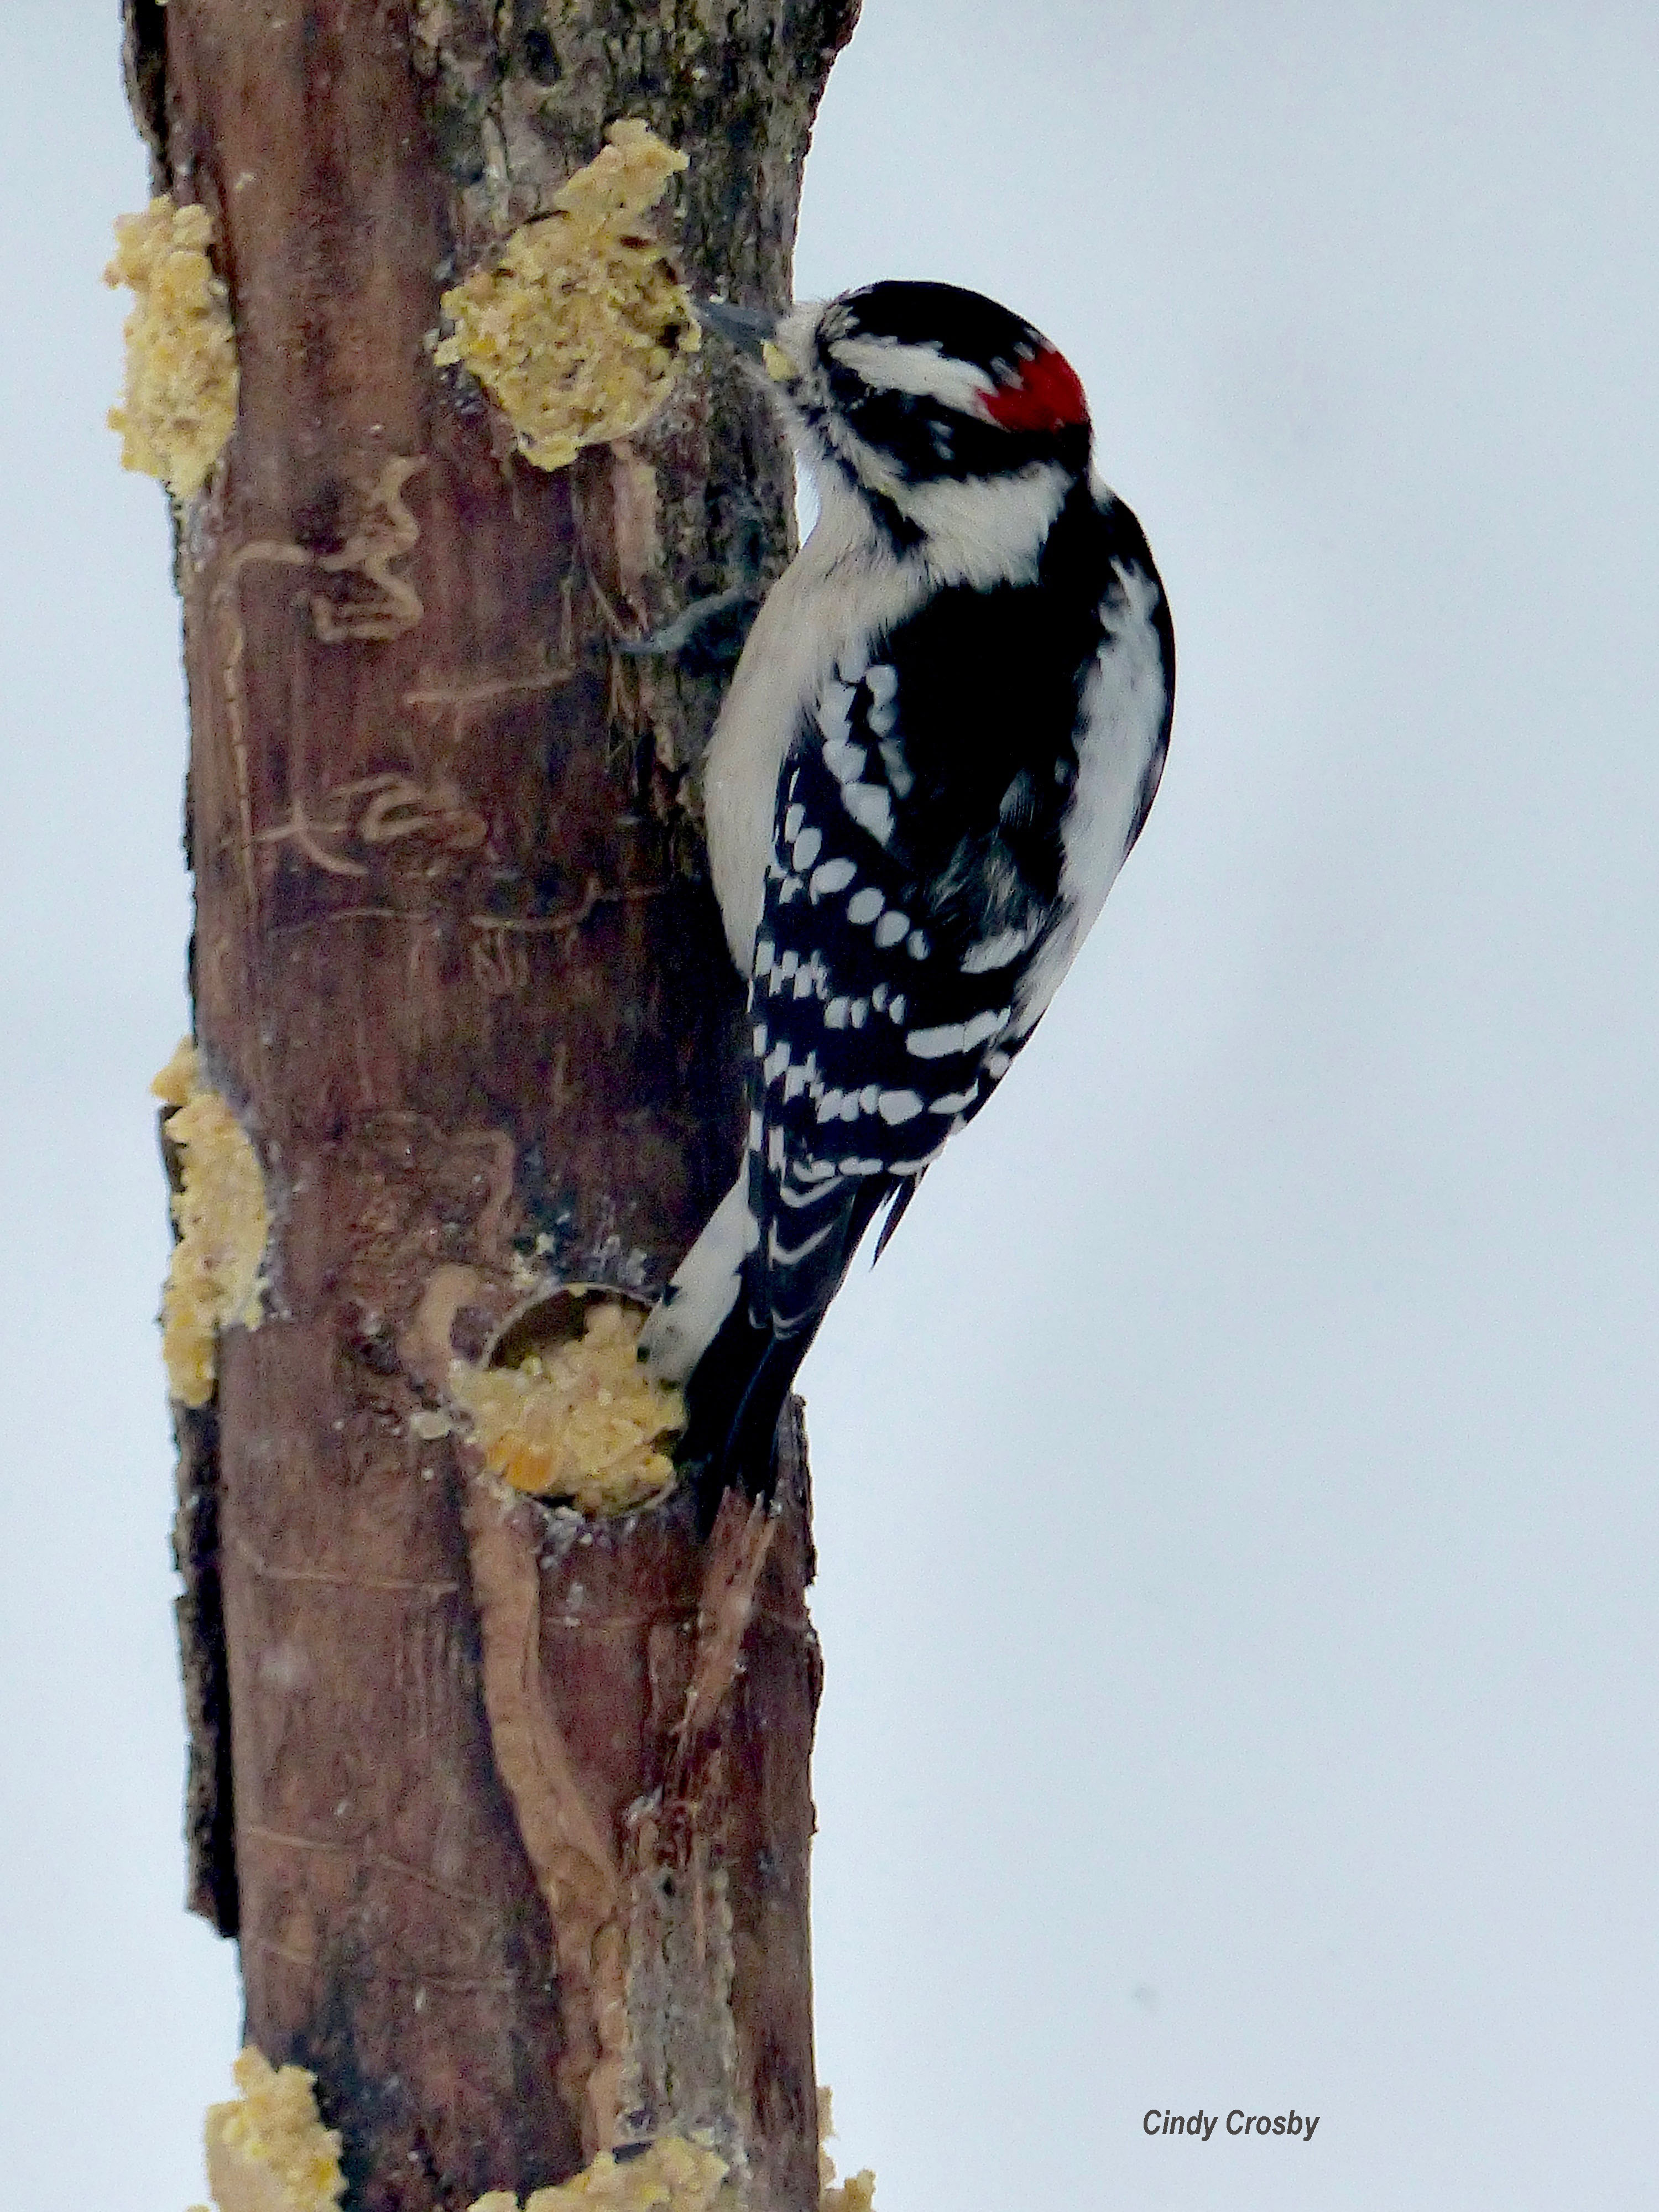 WoodpeckeronashfeederWMbarkbutter12719.jpg